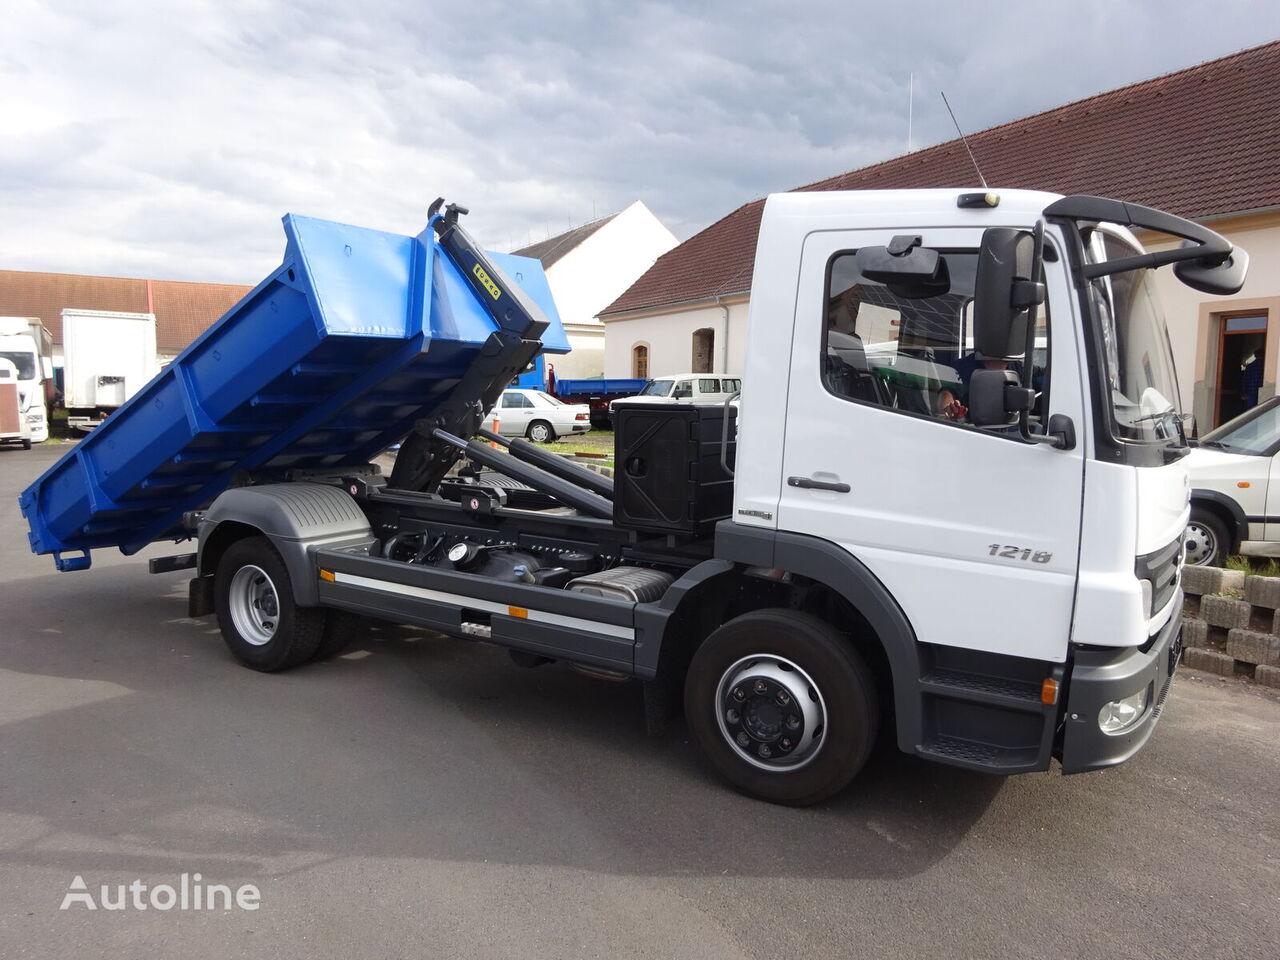 MERCEDES-BENZ Atego 1217 Zcela nový nosič Kontejnerů kravas automašīna pacēlājs ar āķi